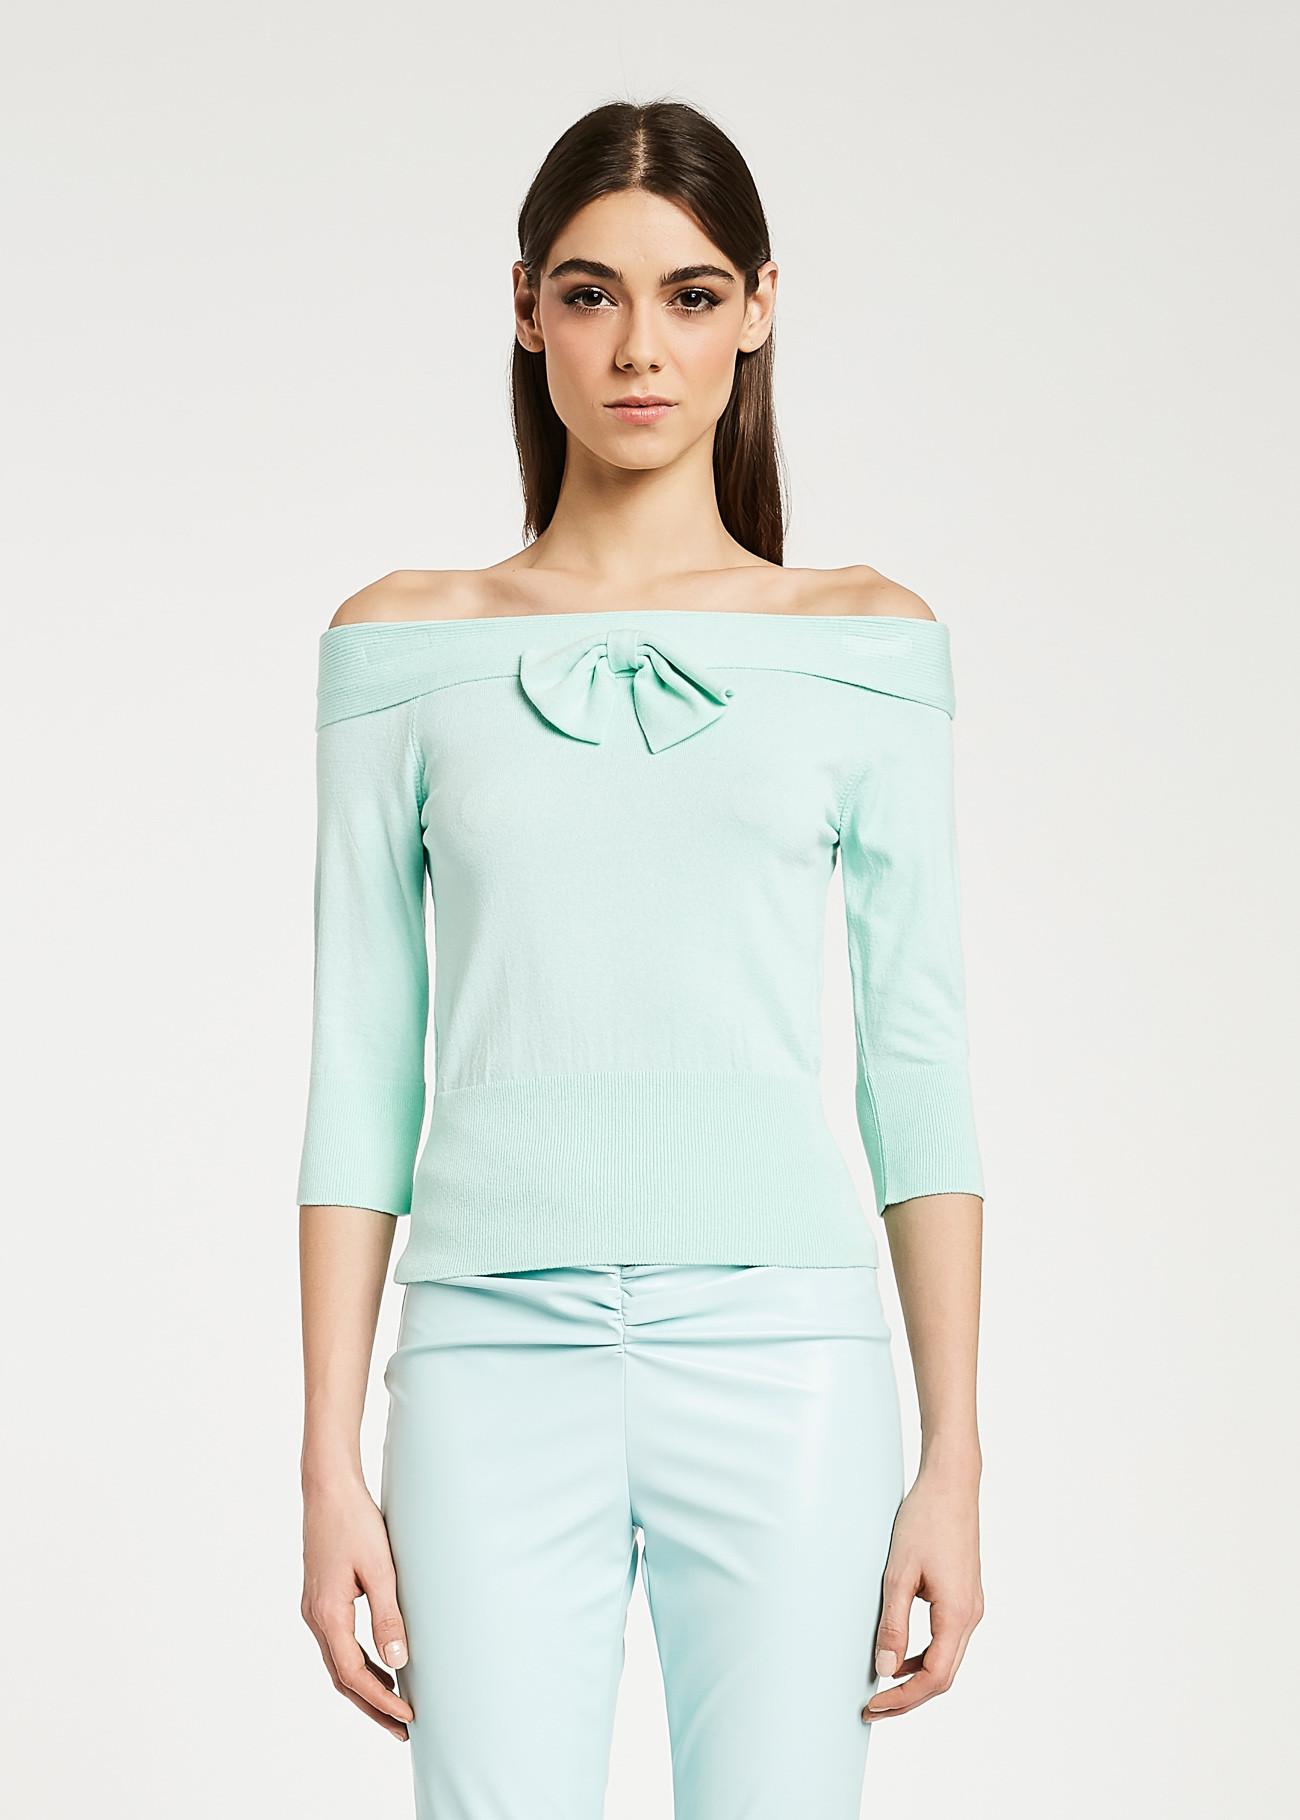 Sweater made of soft stretch viscose yarns DENNY ROSE |  | DD500212001